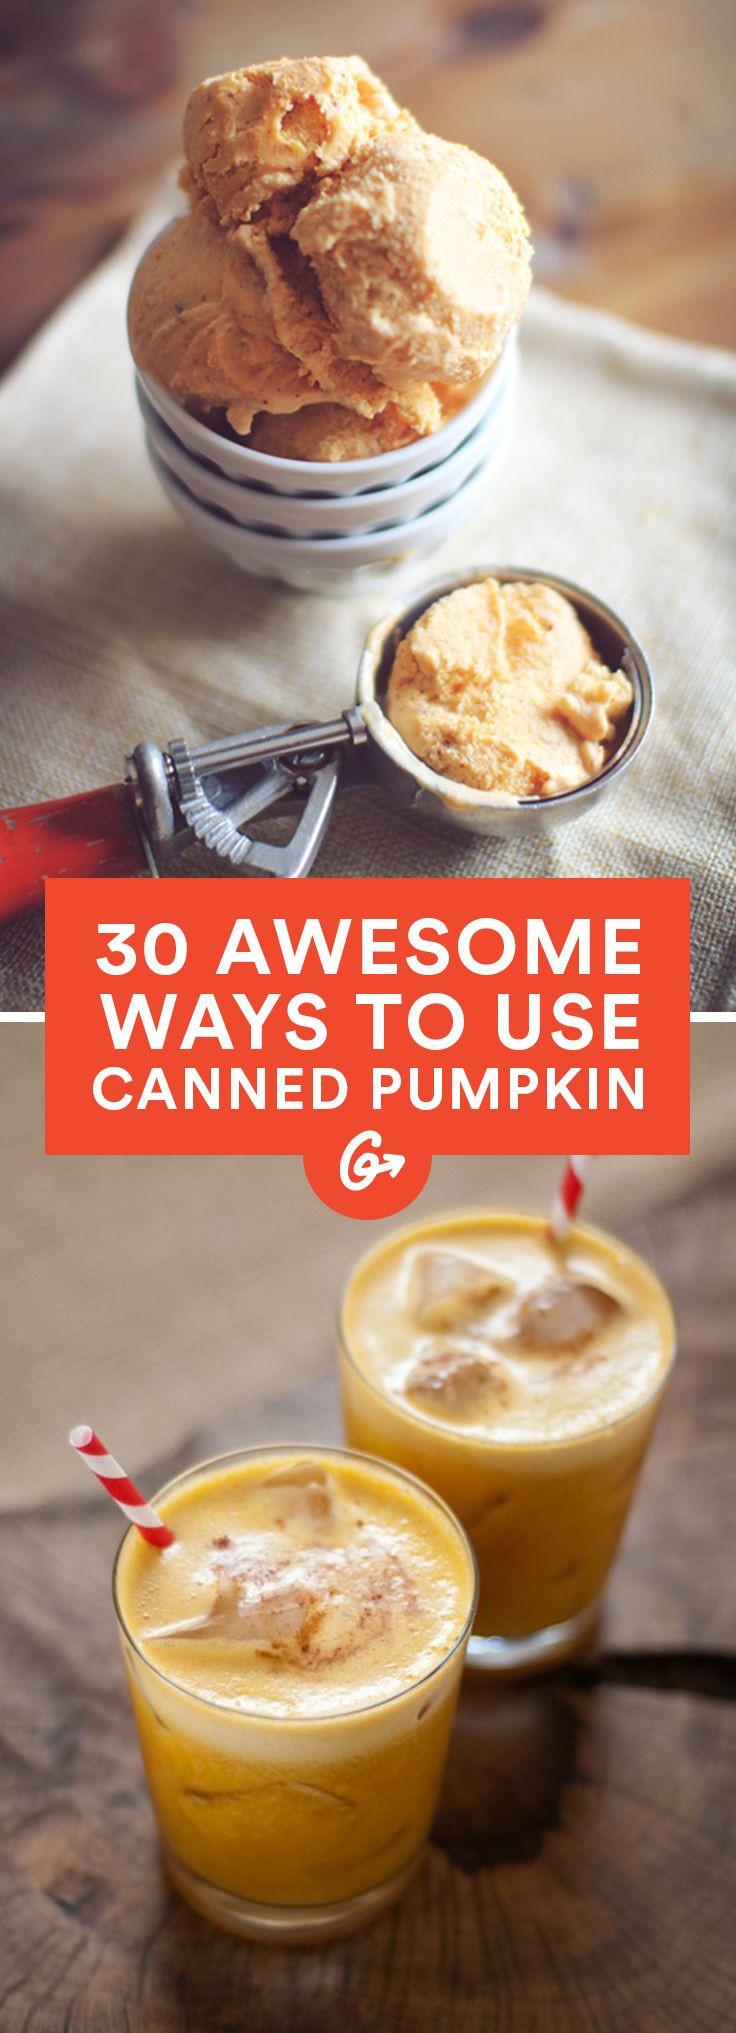 Pumpkin Recipes Healthy  100 Canned Pumpkin Recipes on Pinterest